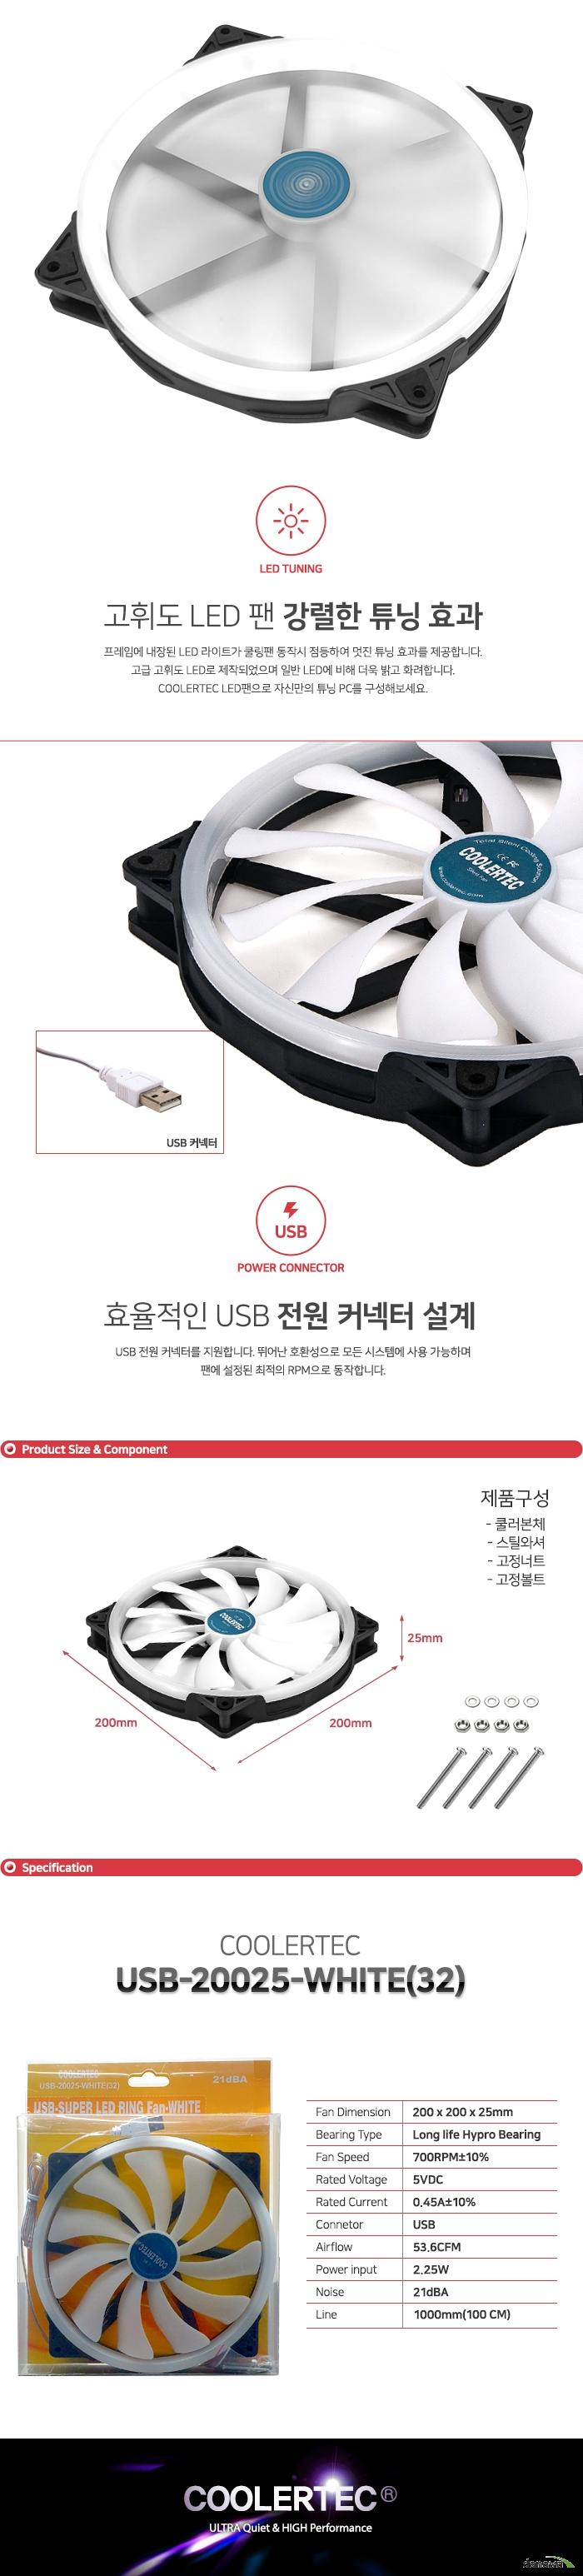 COOLERTEC USB-20025-WHITE(32)